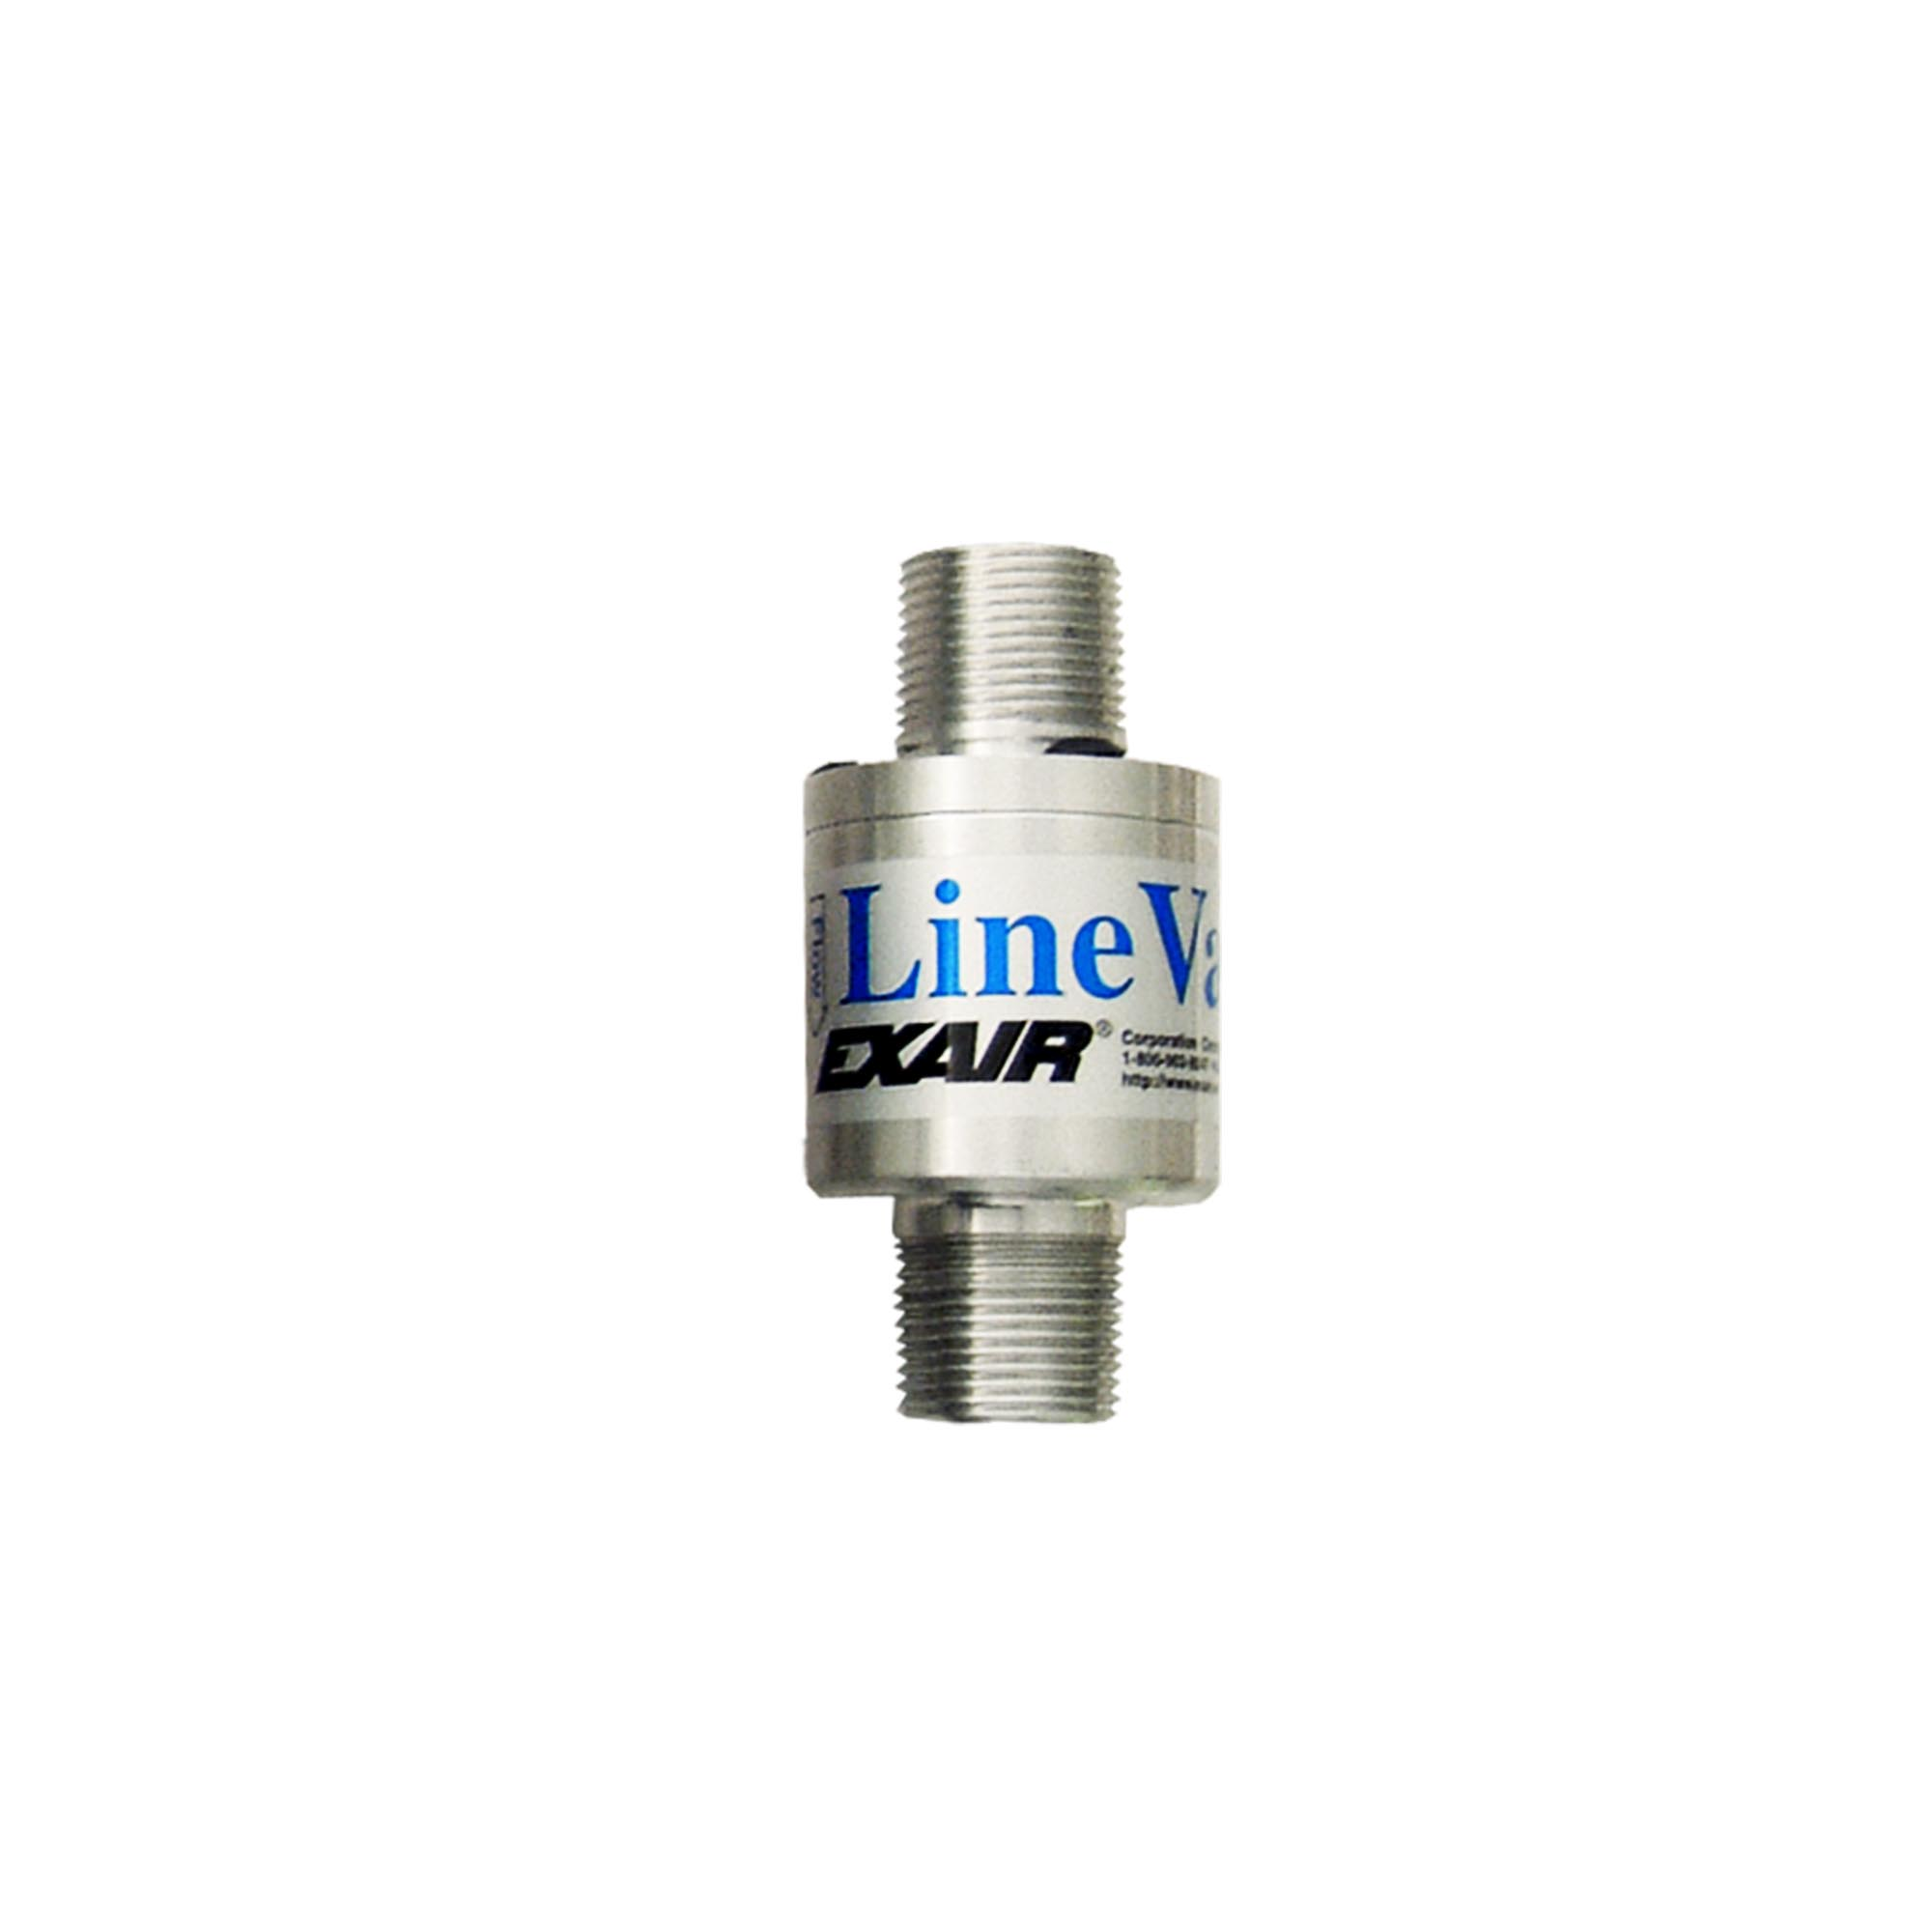 Model 140075 3/4 NPT Alum. Threaded Line Vac